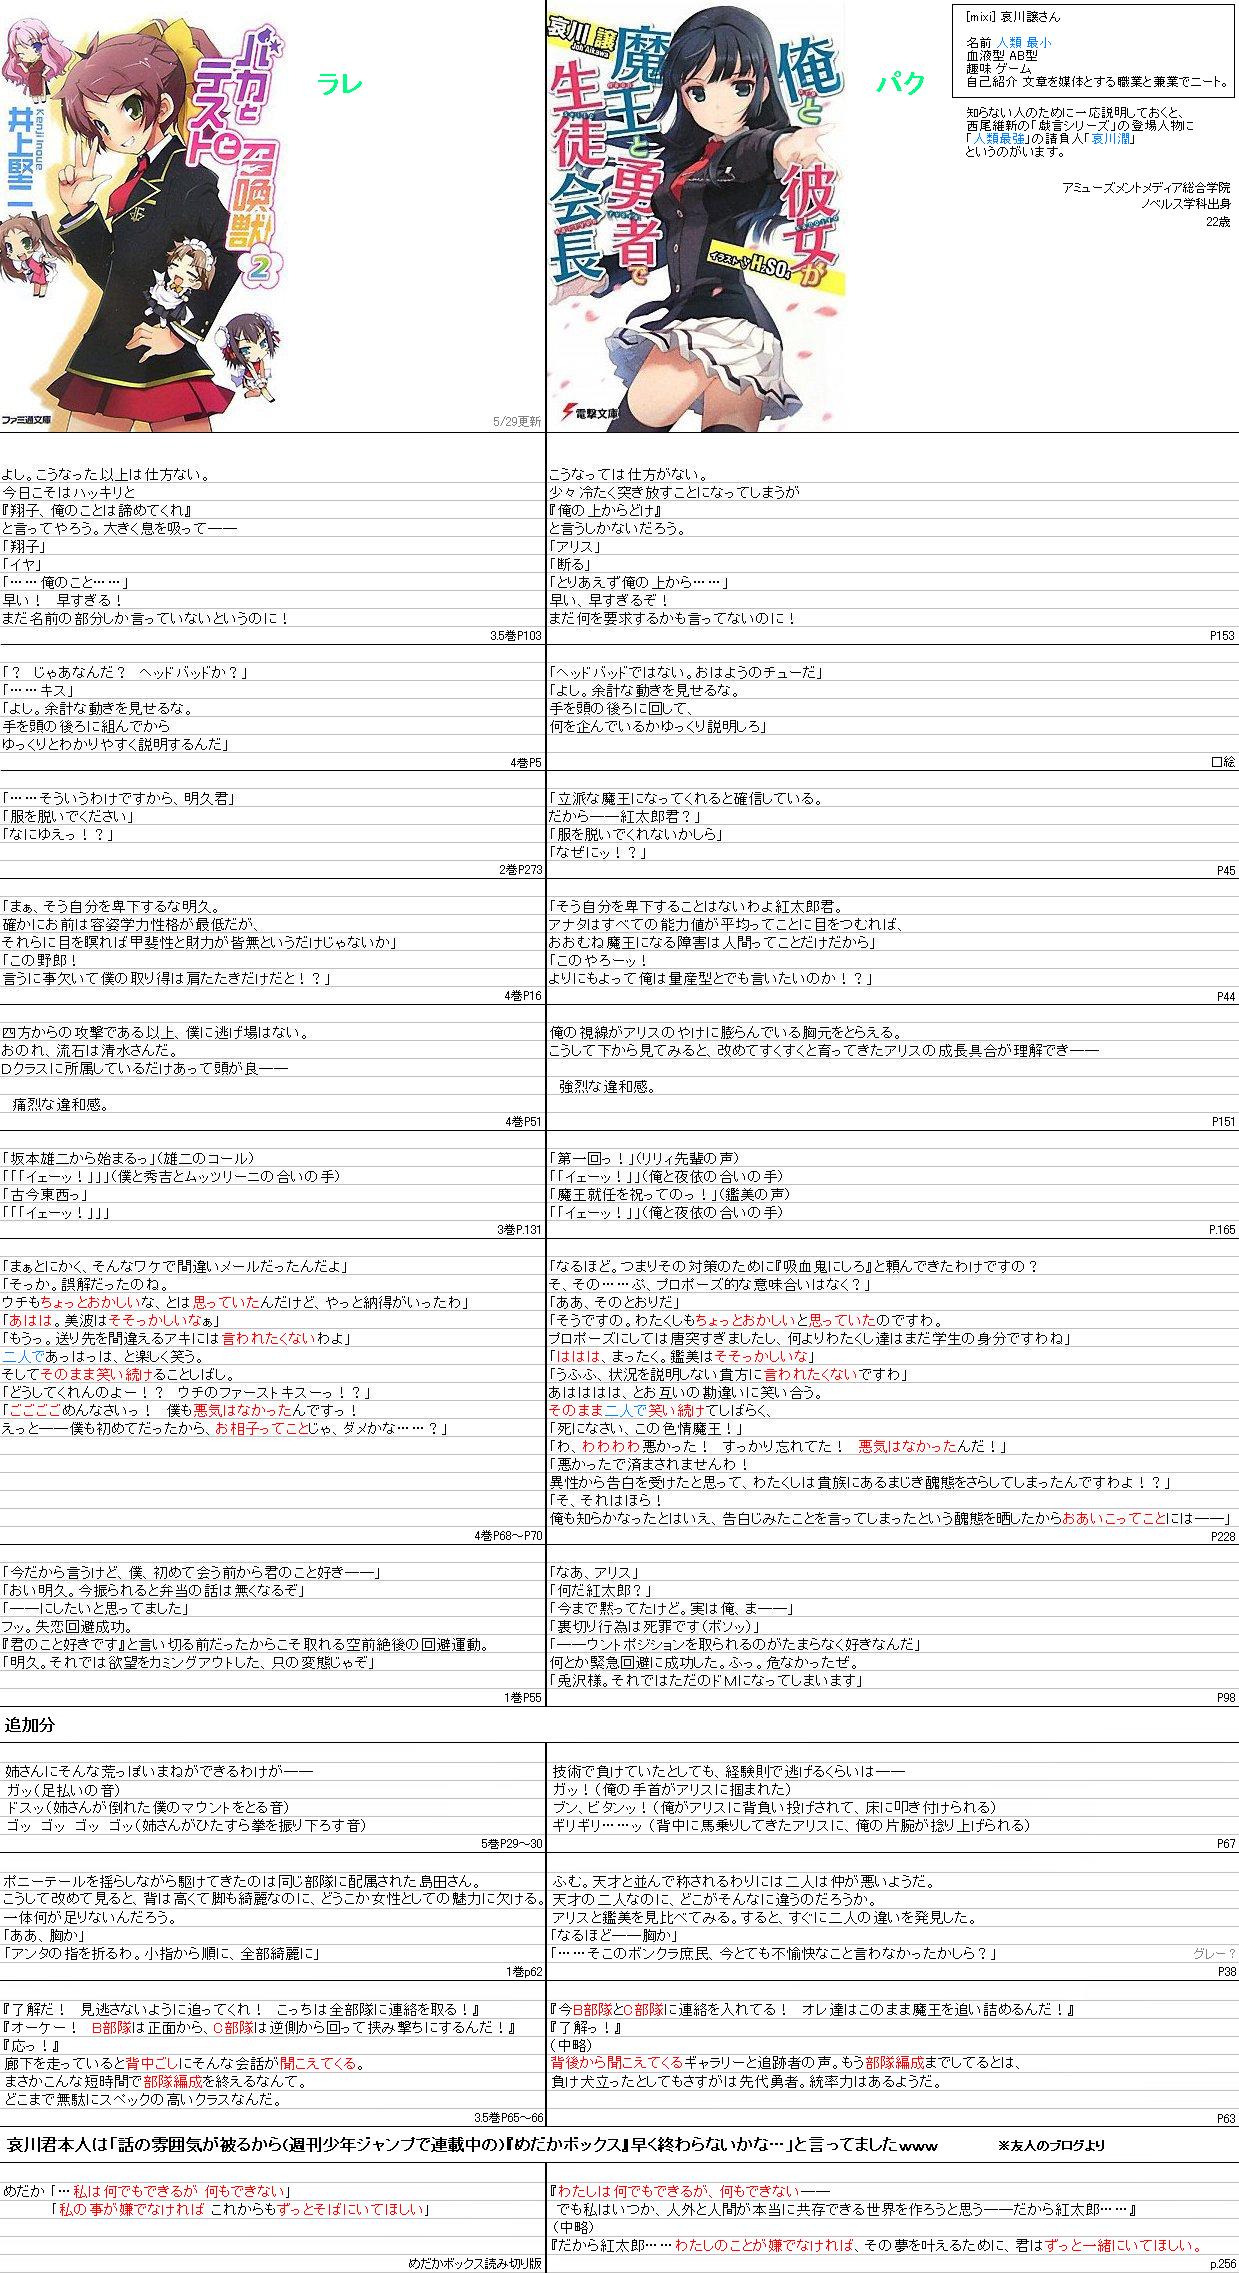 http://livedoor.blogimg.jp/upruyo/imgs/3/d/3db1d695.jpg